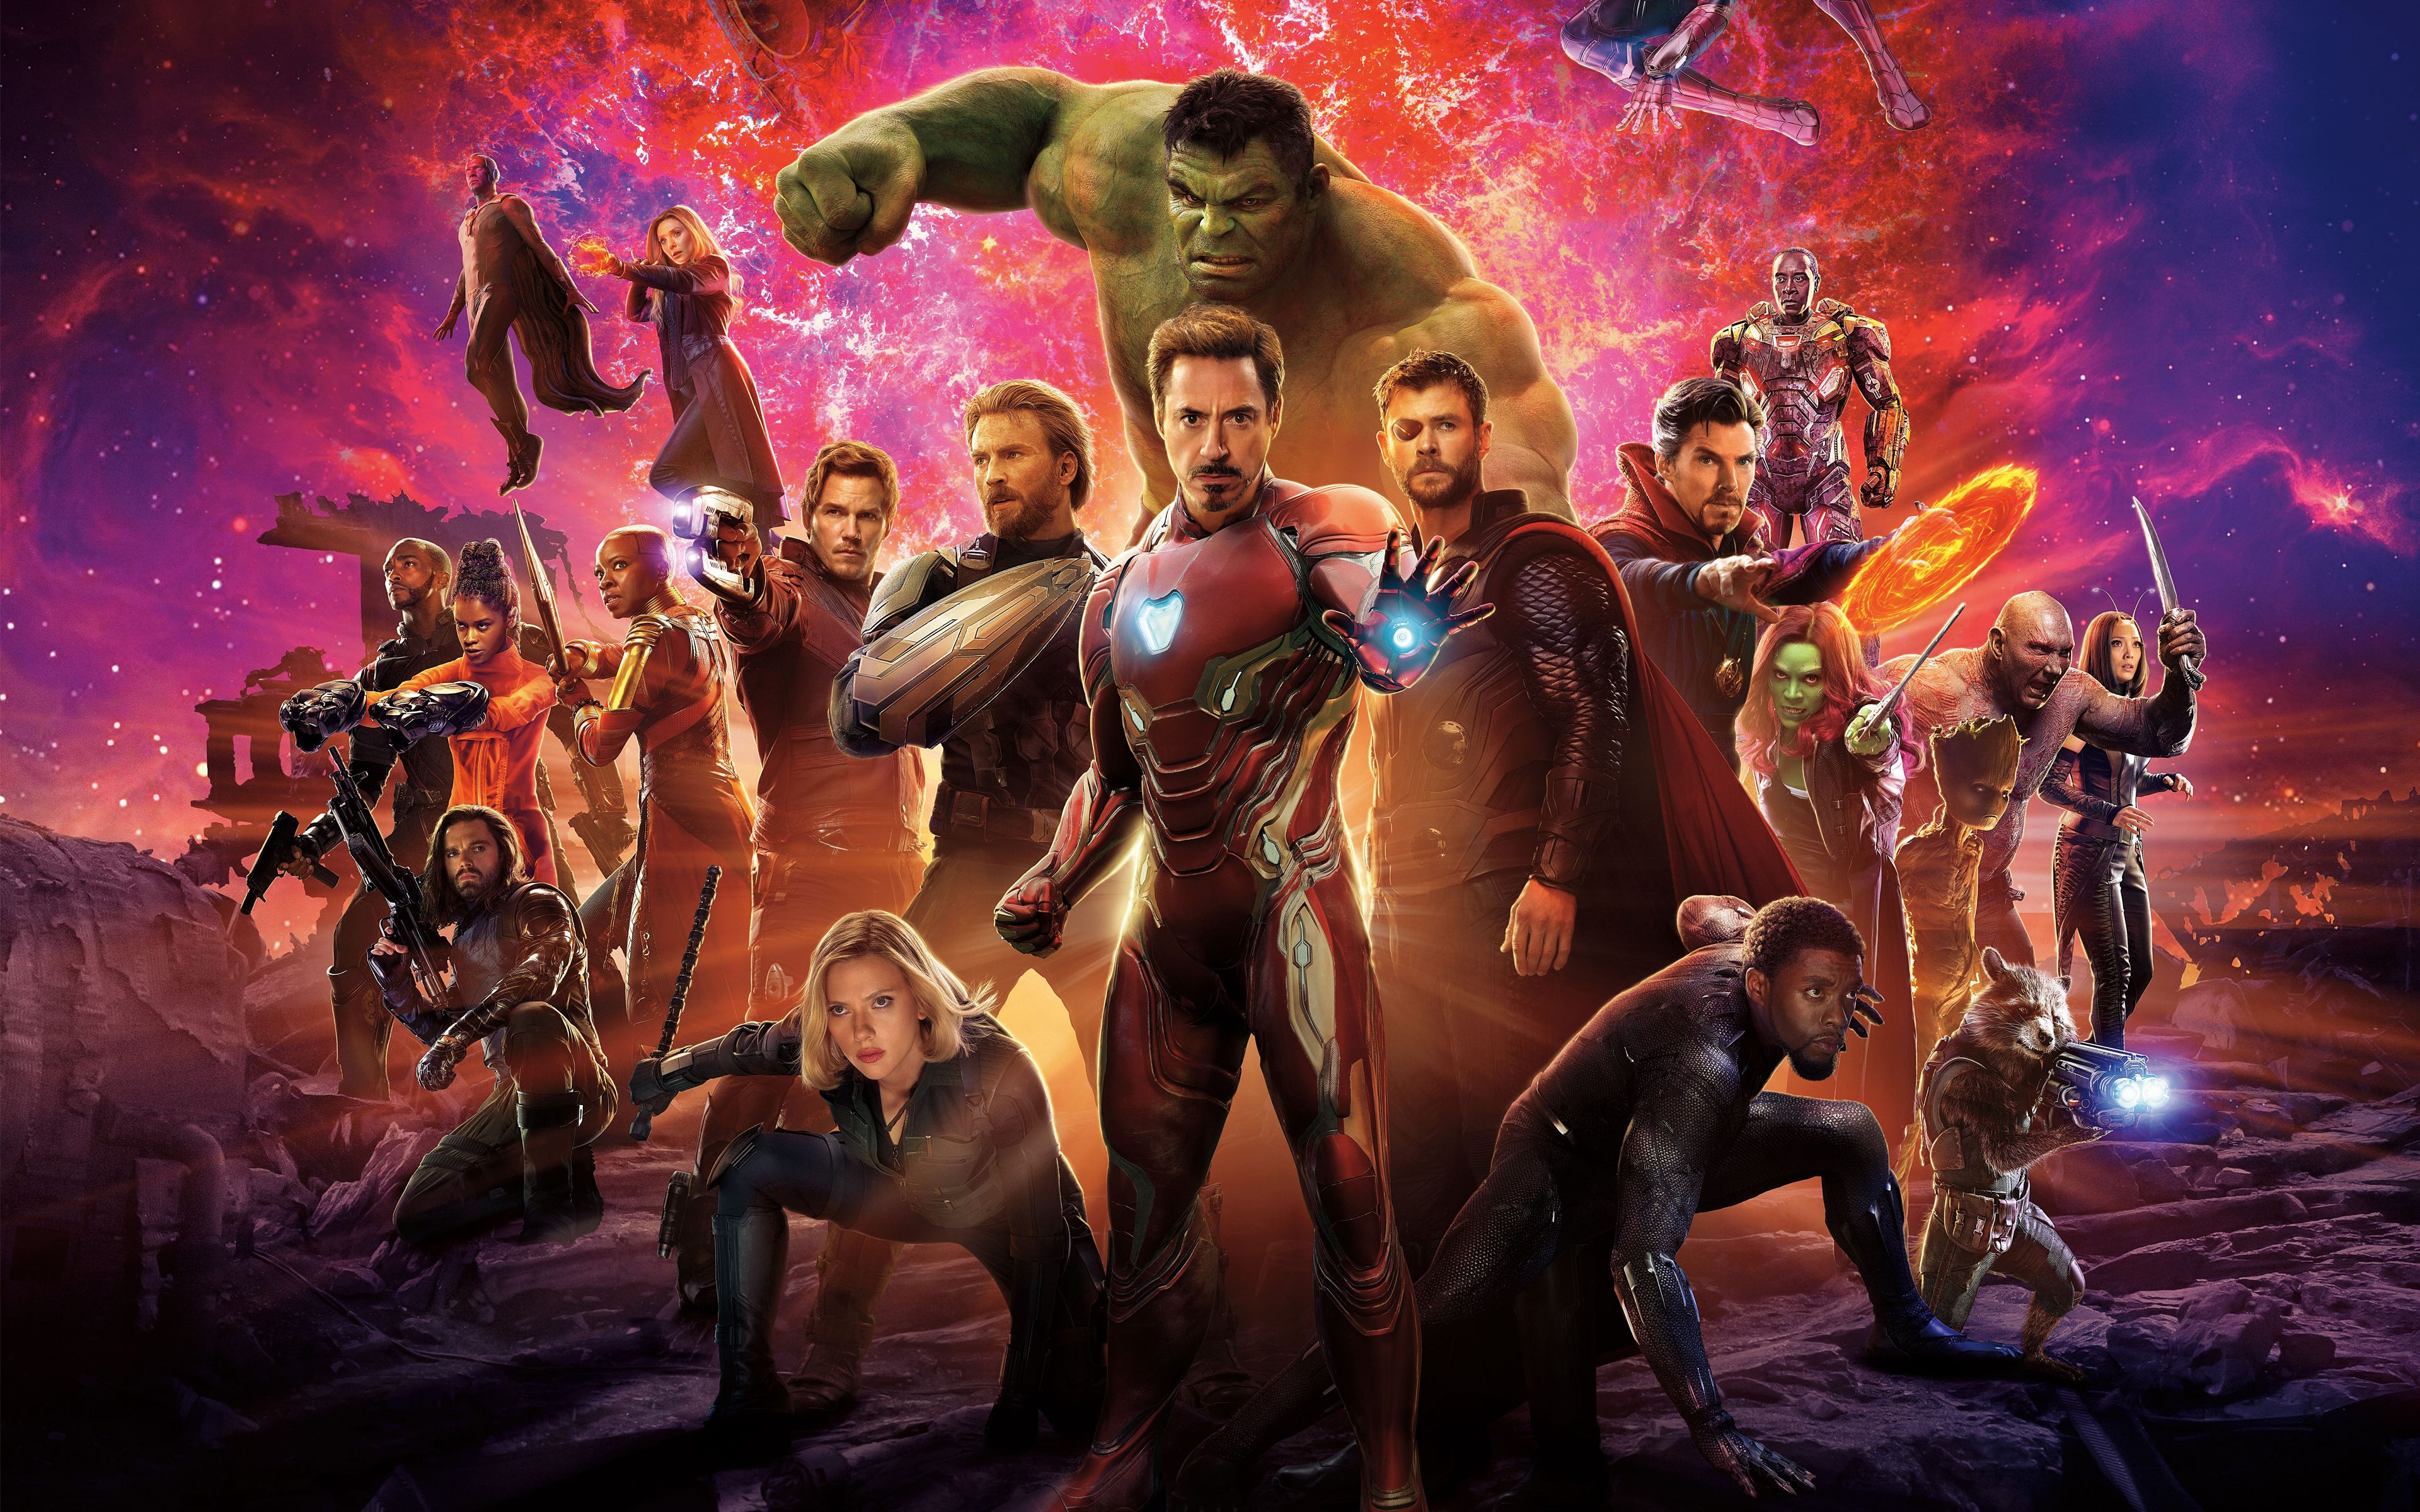 "3840x2160 Wallpaper Avengers Infinity War Thor Groot Rocket Star Lord Gamora ..."">"